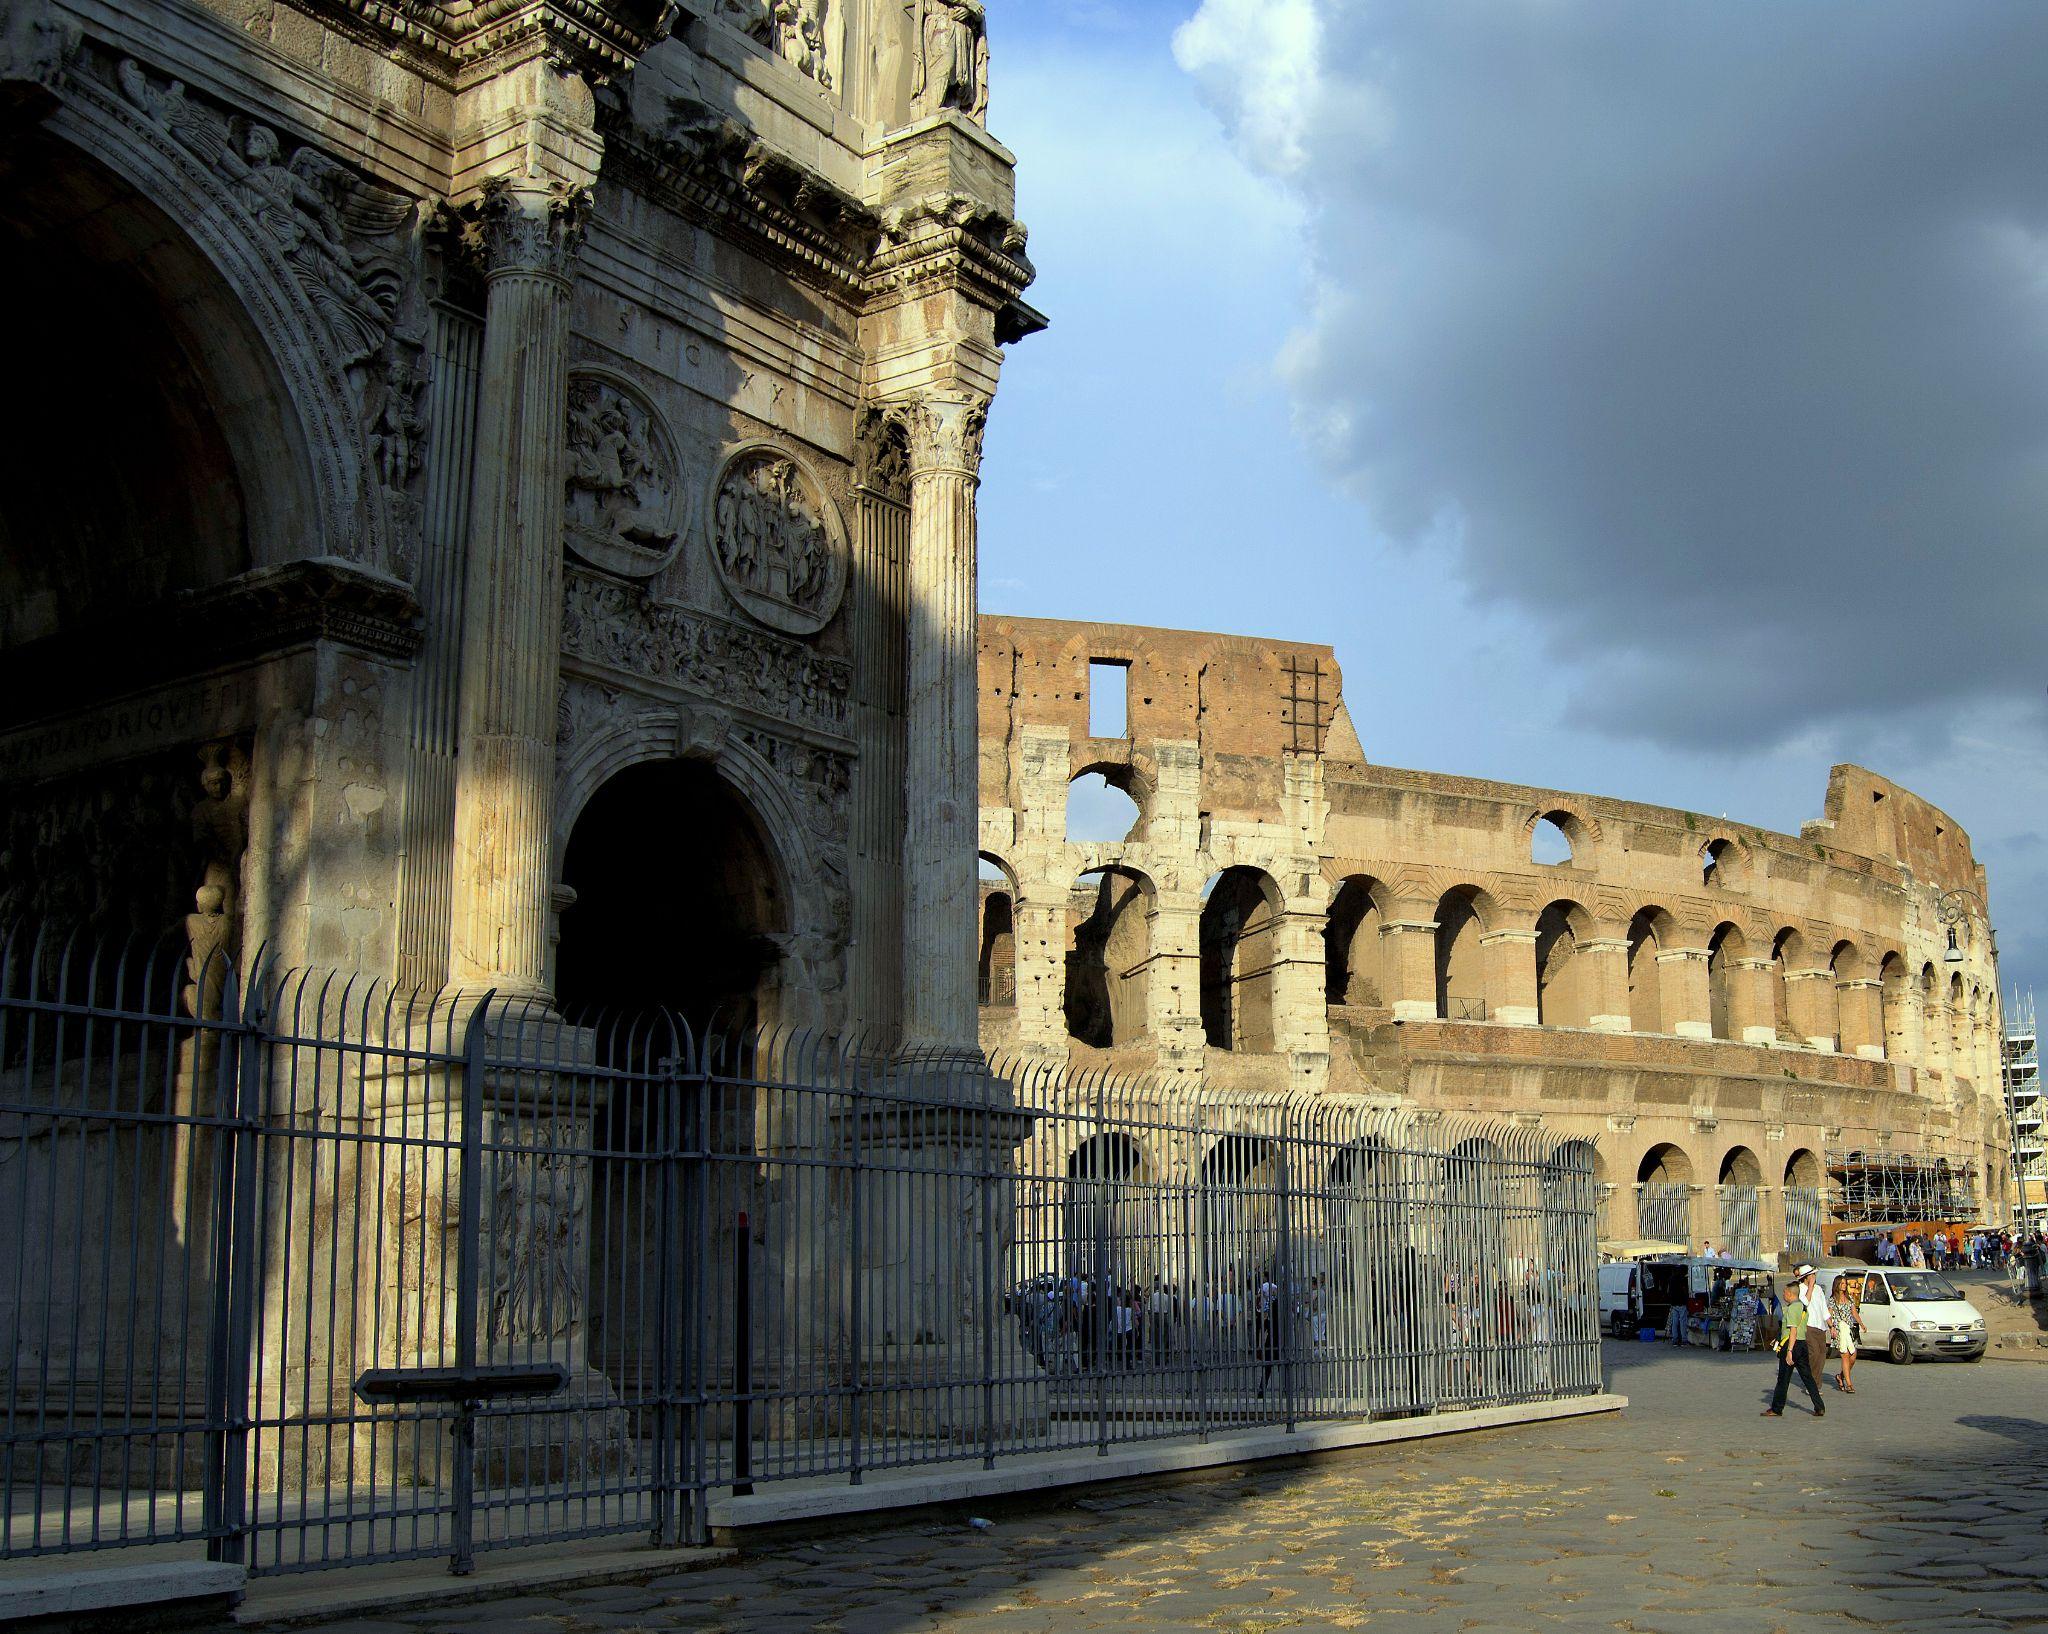 Roma, Colosseo by PatriziaCortellessa